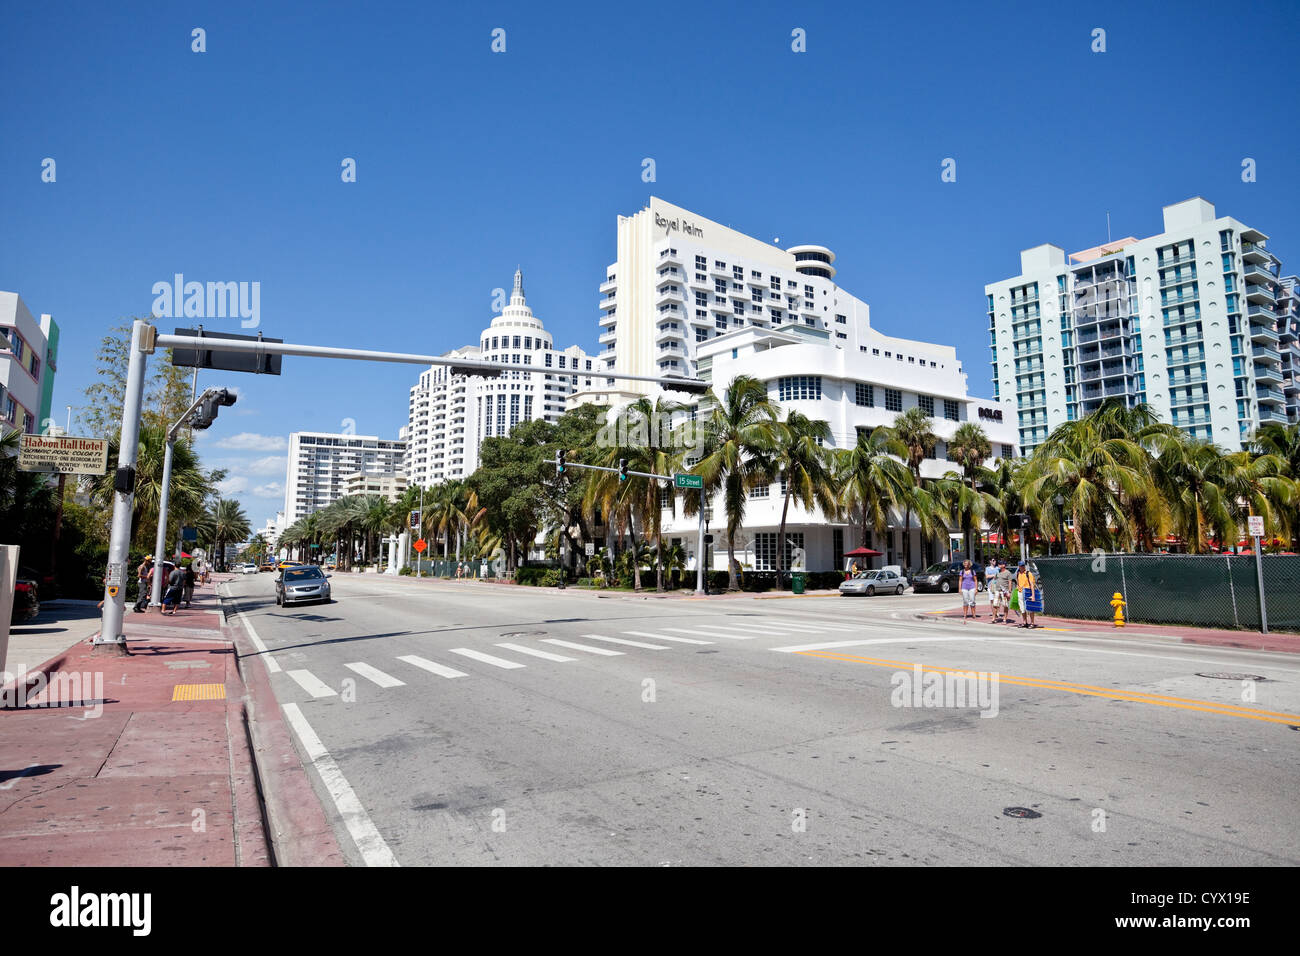 Art deco District, Collins Avenue, South Beach, Miami Beach, Florida, USA - Stock Image